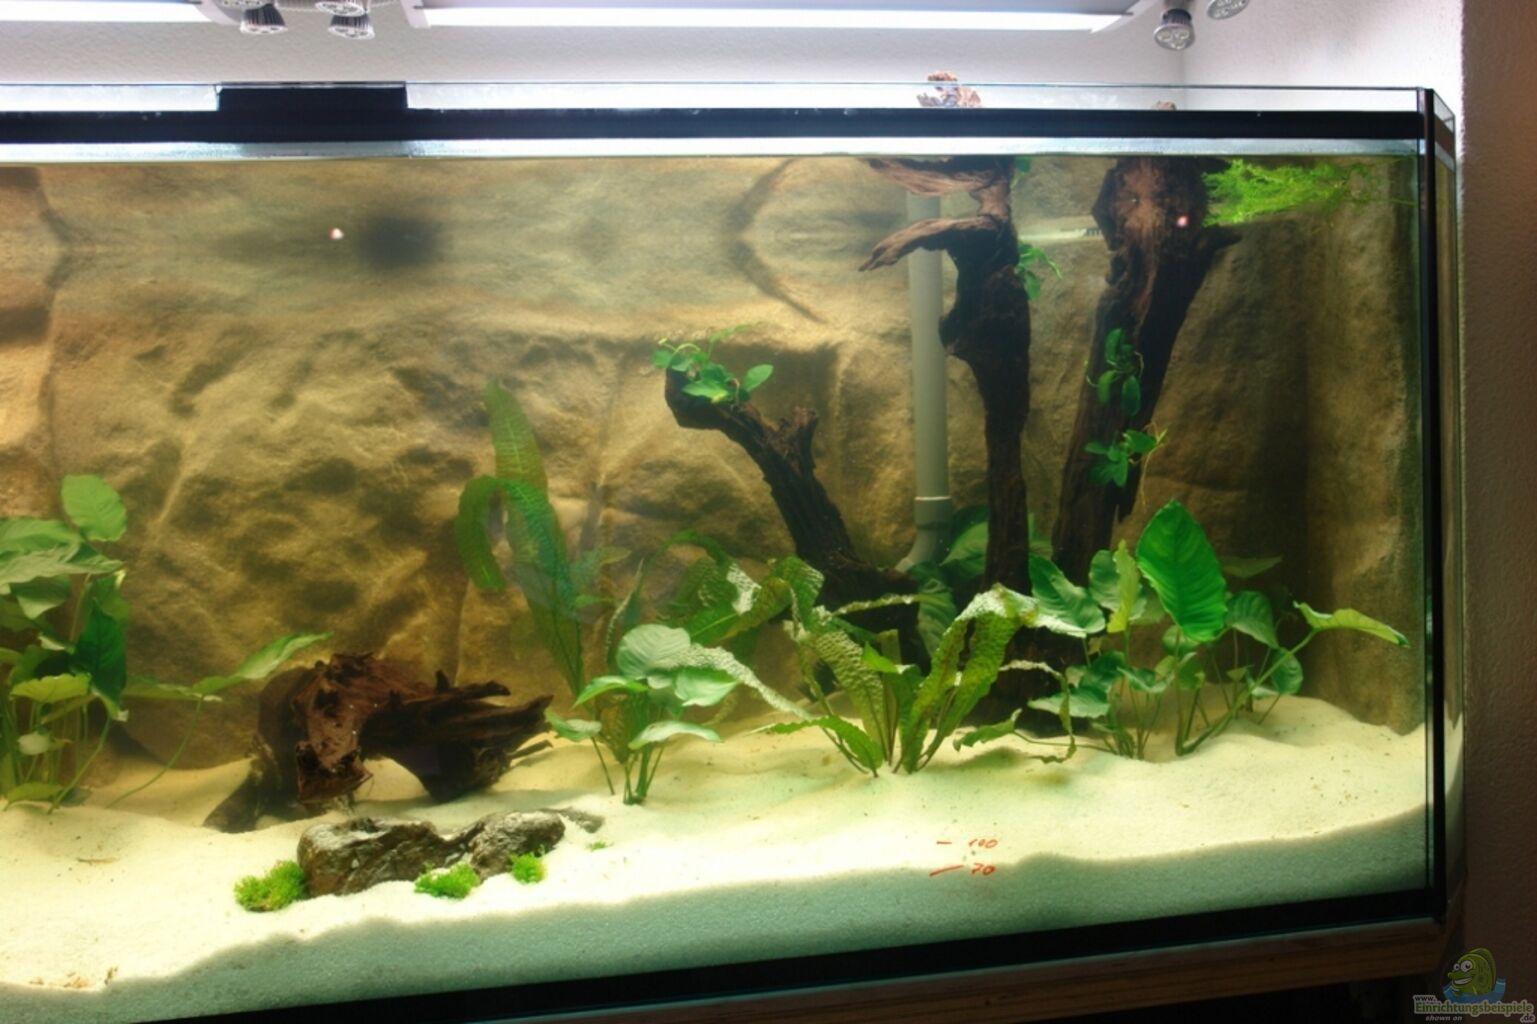 aquarium von paul kerschbaumer s dtirols amazonas. Black Bedroom Furniture Sets. Home Design Ideas